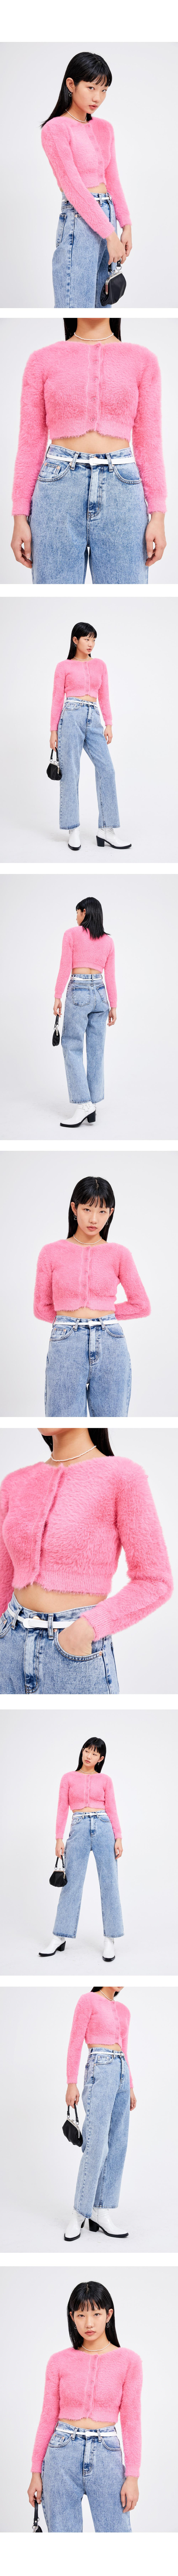 smooth knit crop cardigan - woman